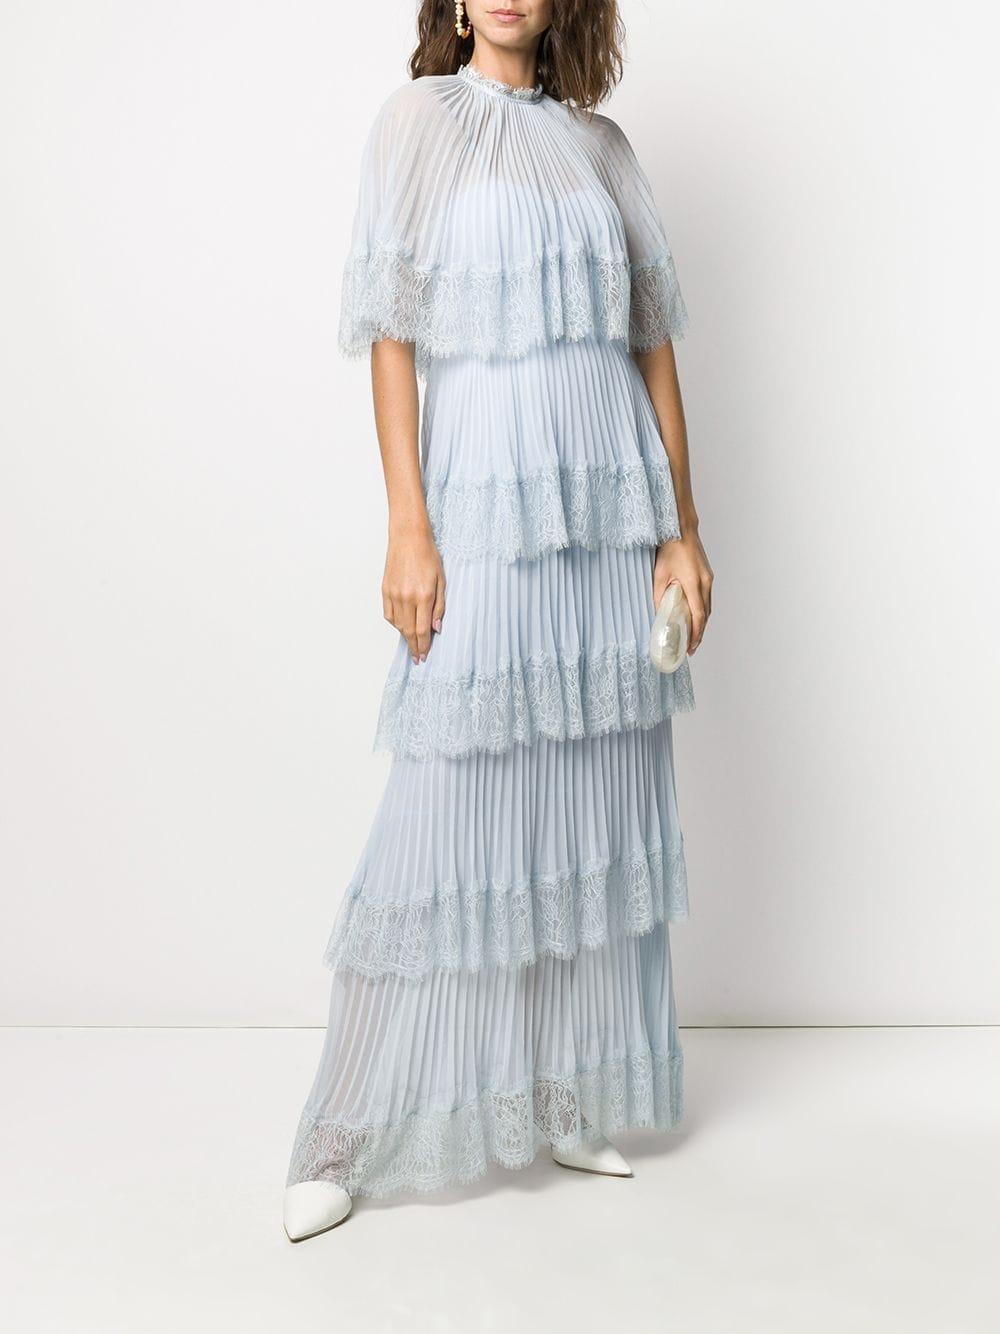 SELF-PORTRAIT Cape Tiered Maxi Dress